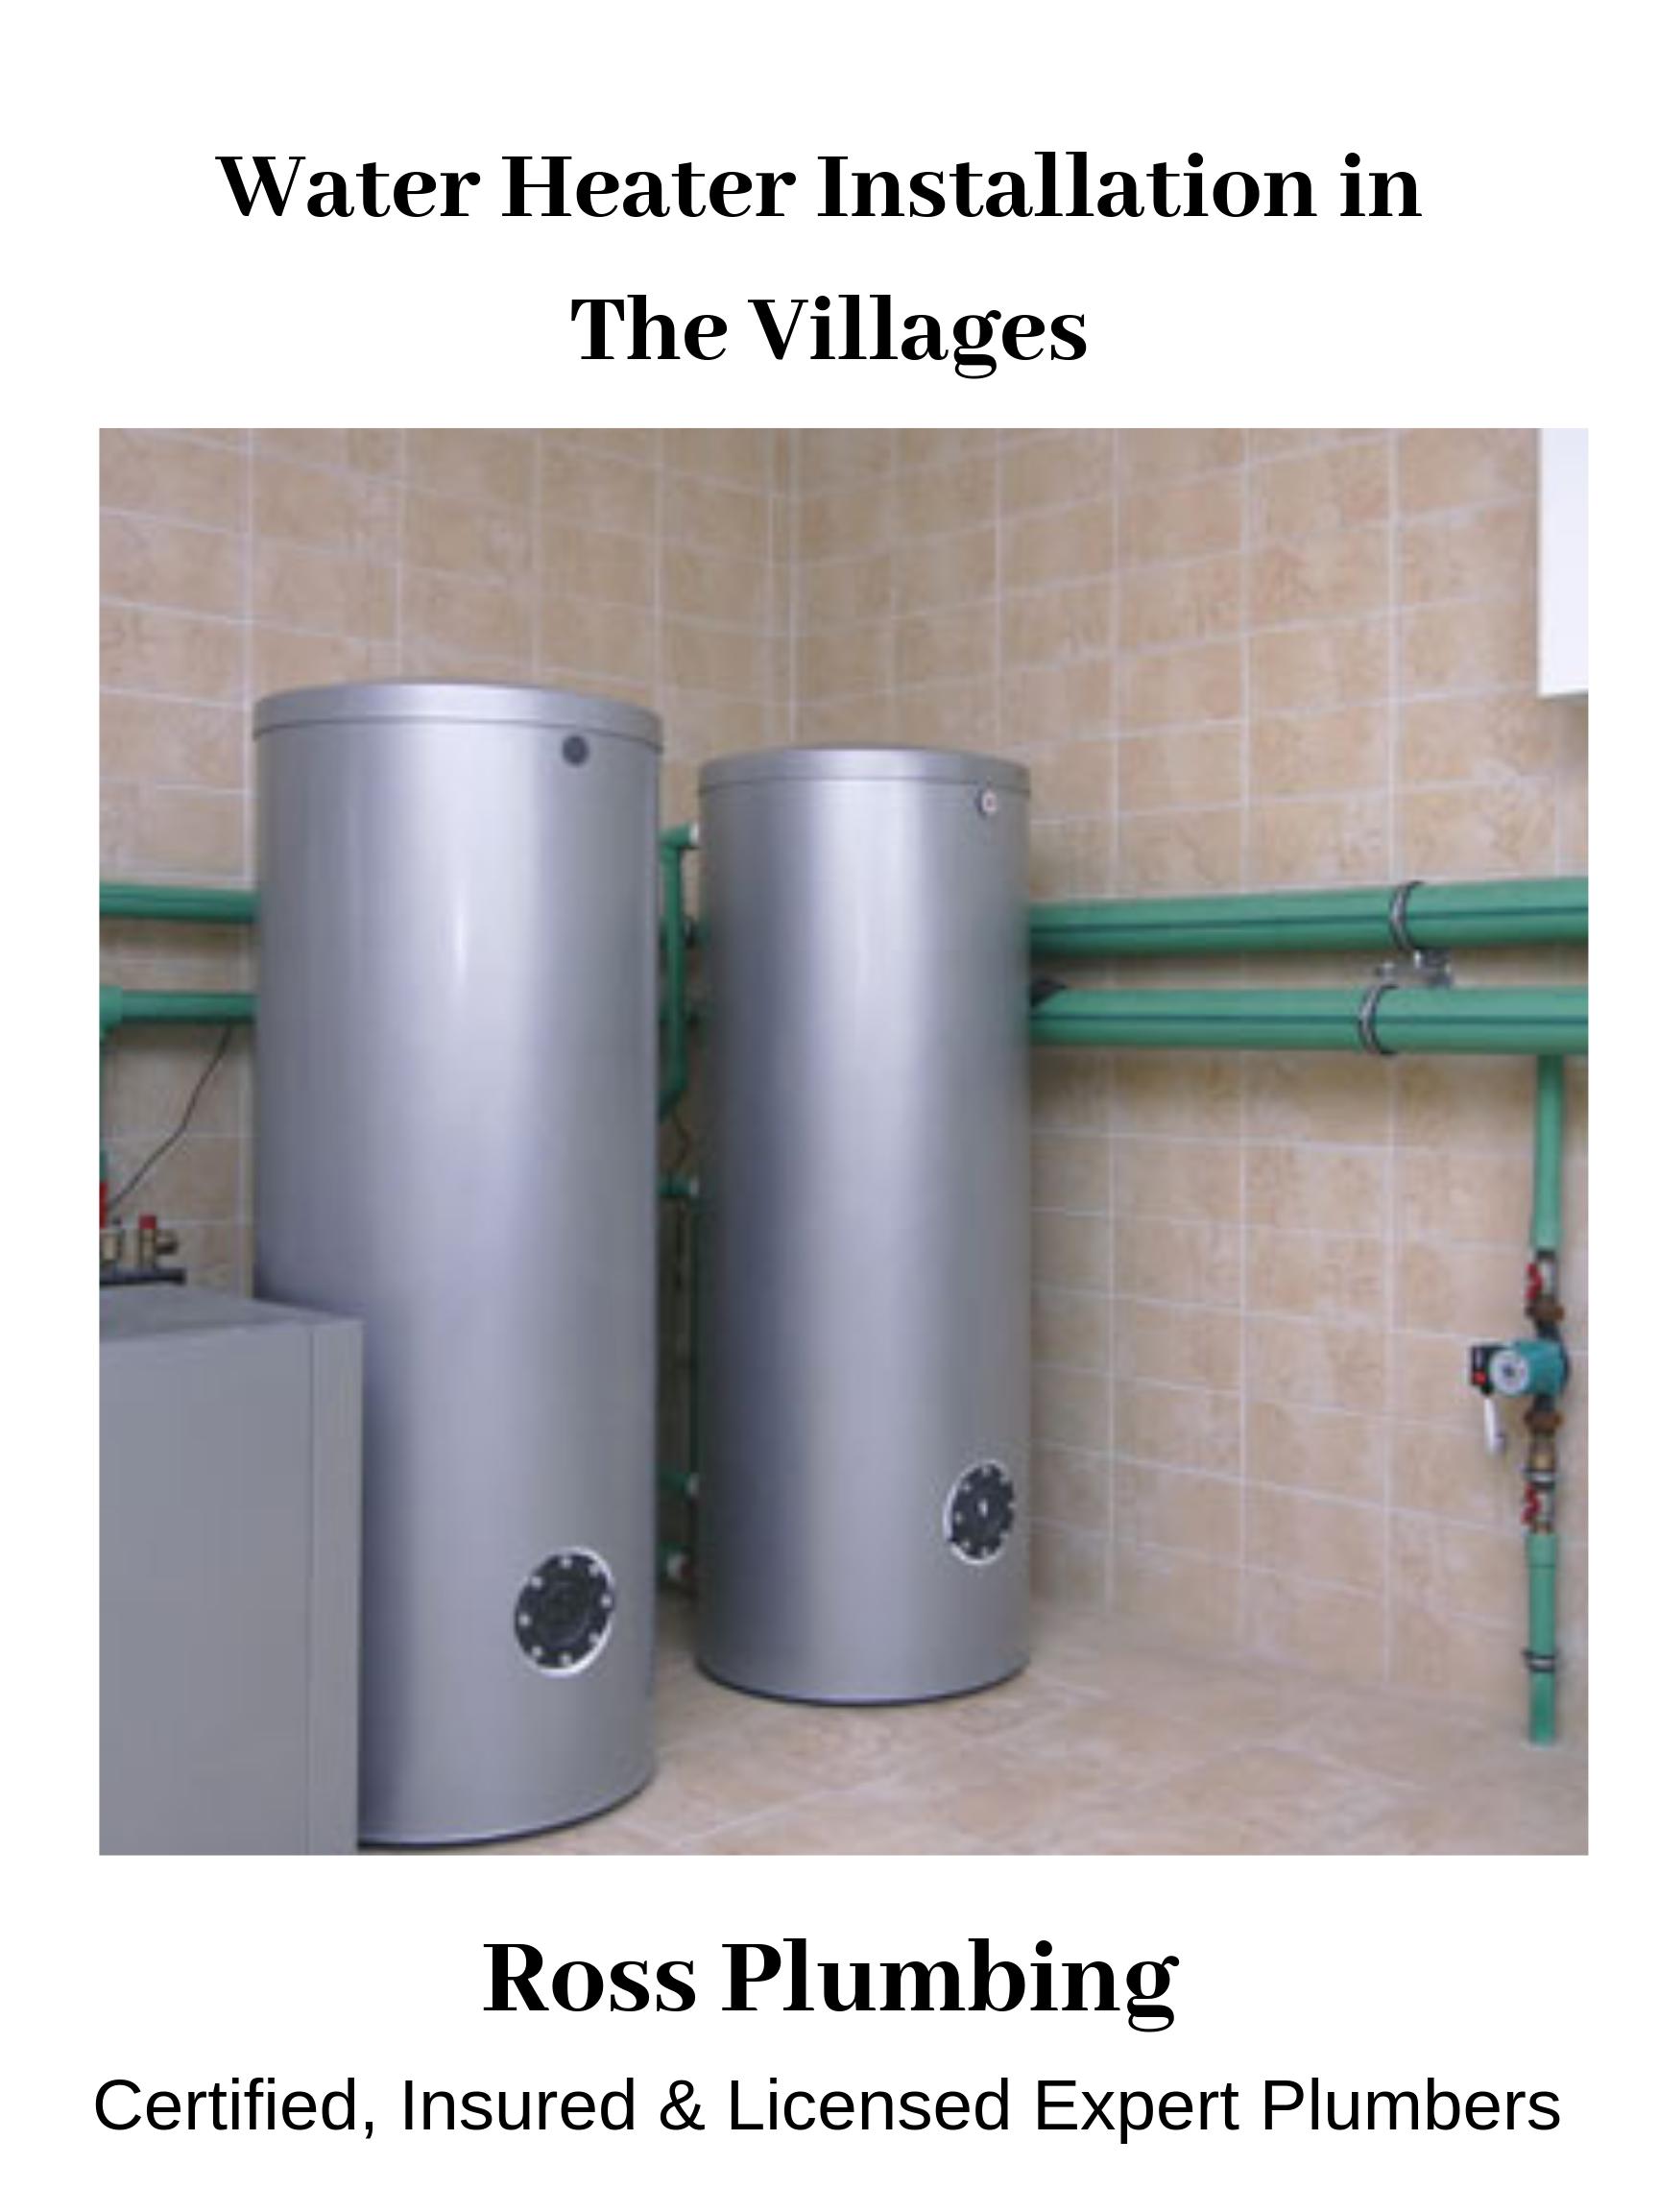 ross plumbing image 2